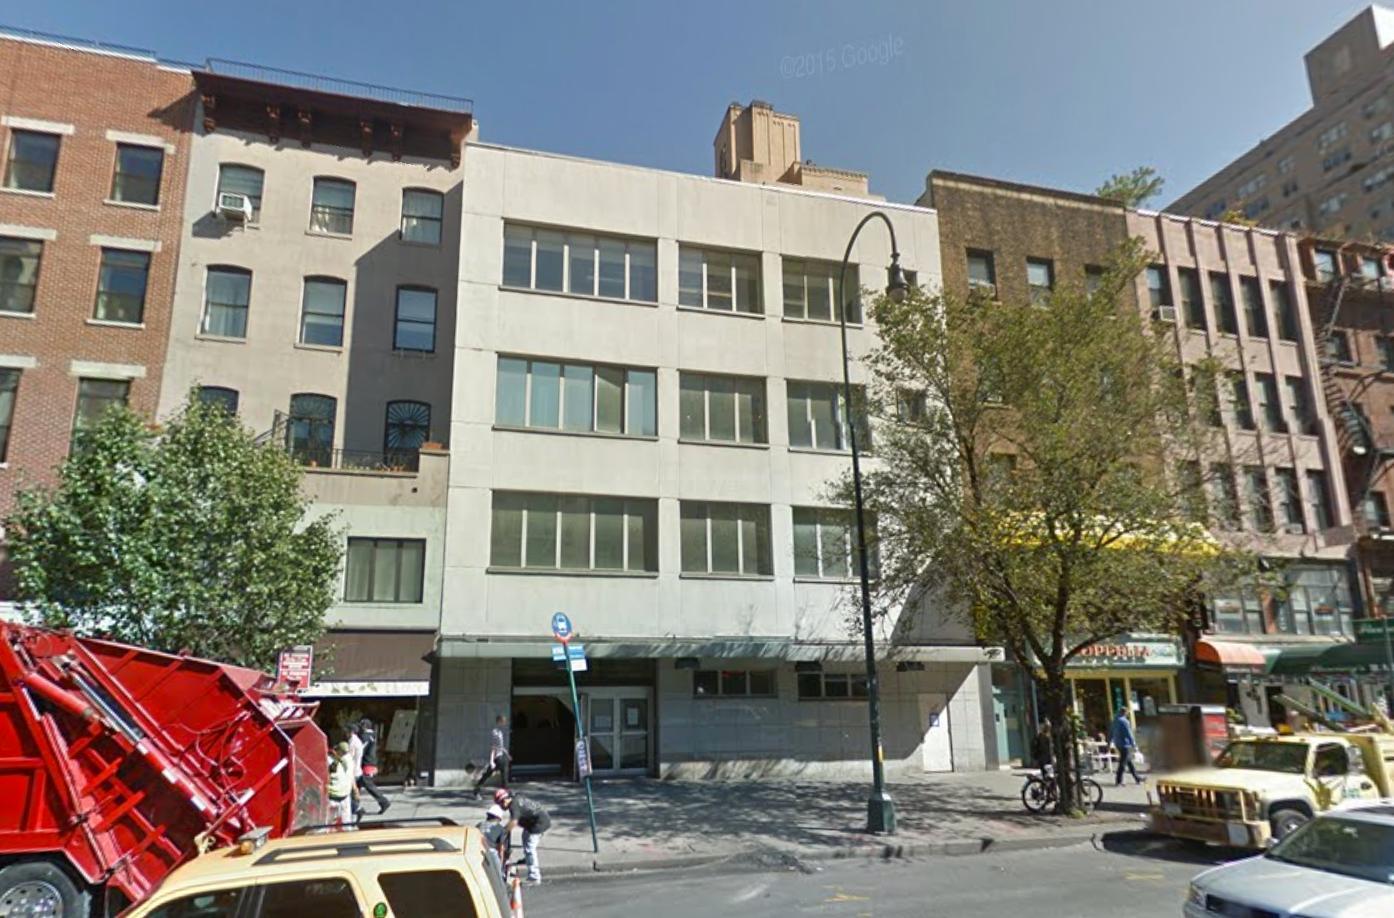 211 West 14th Street